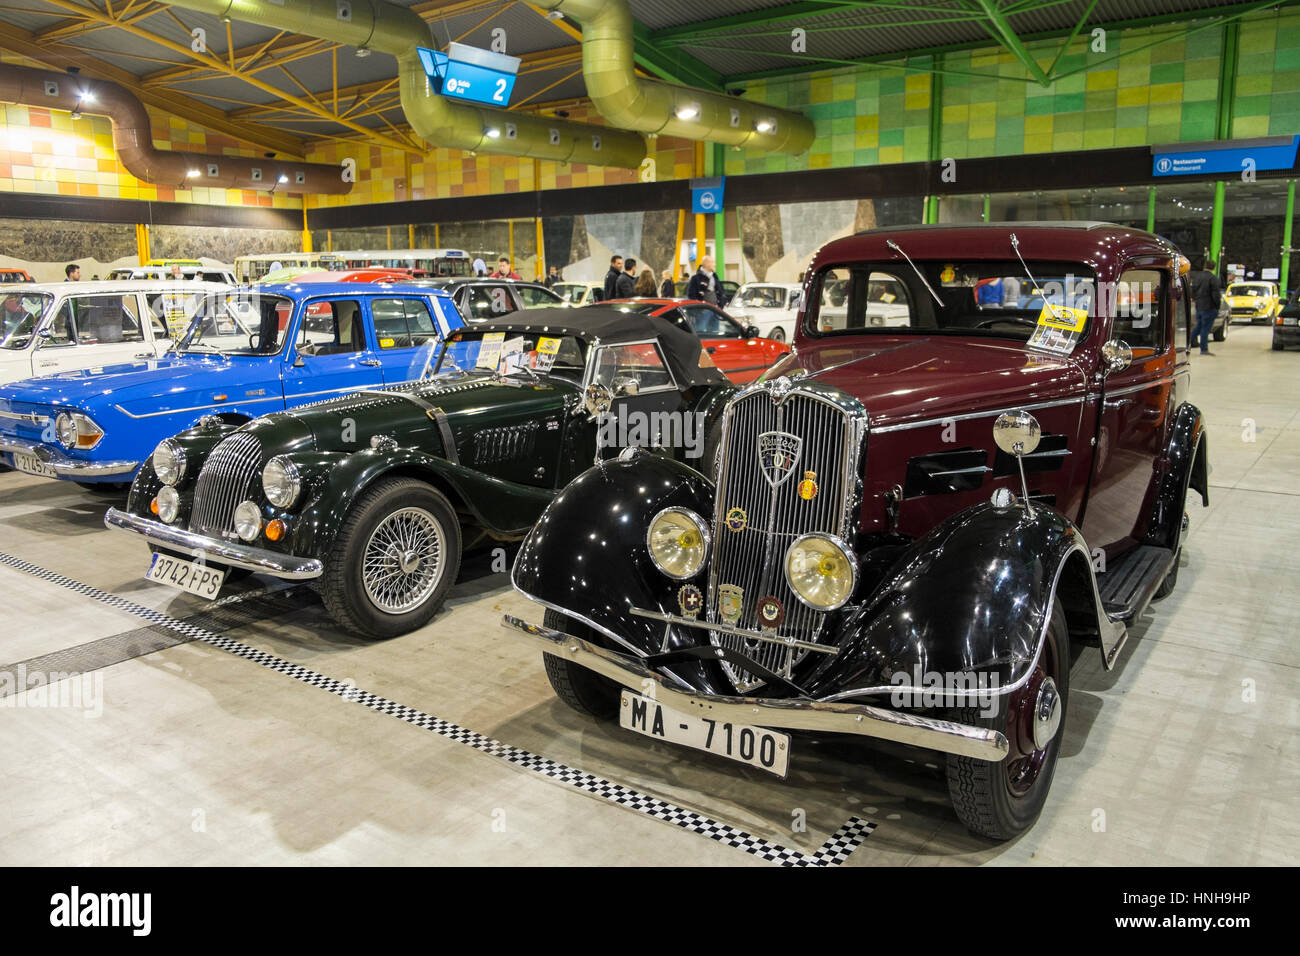 1929-1937 Peugeot 201 - Stock Image